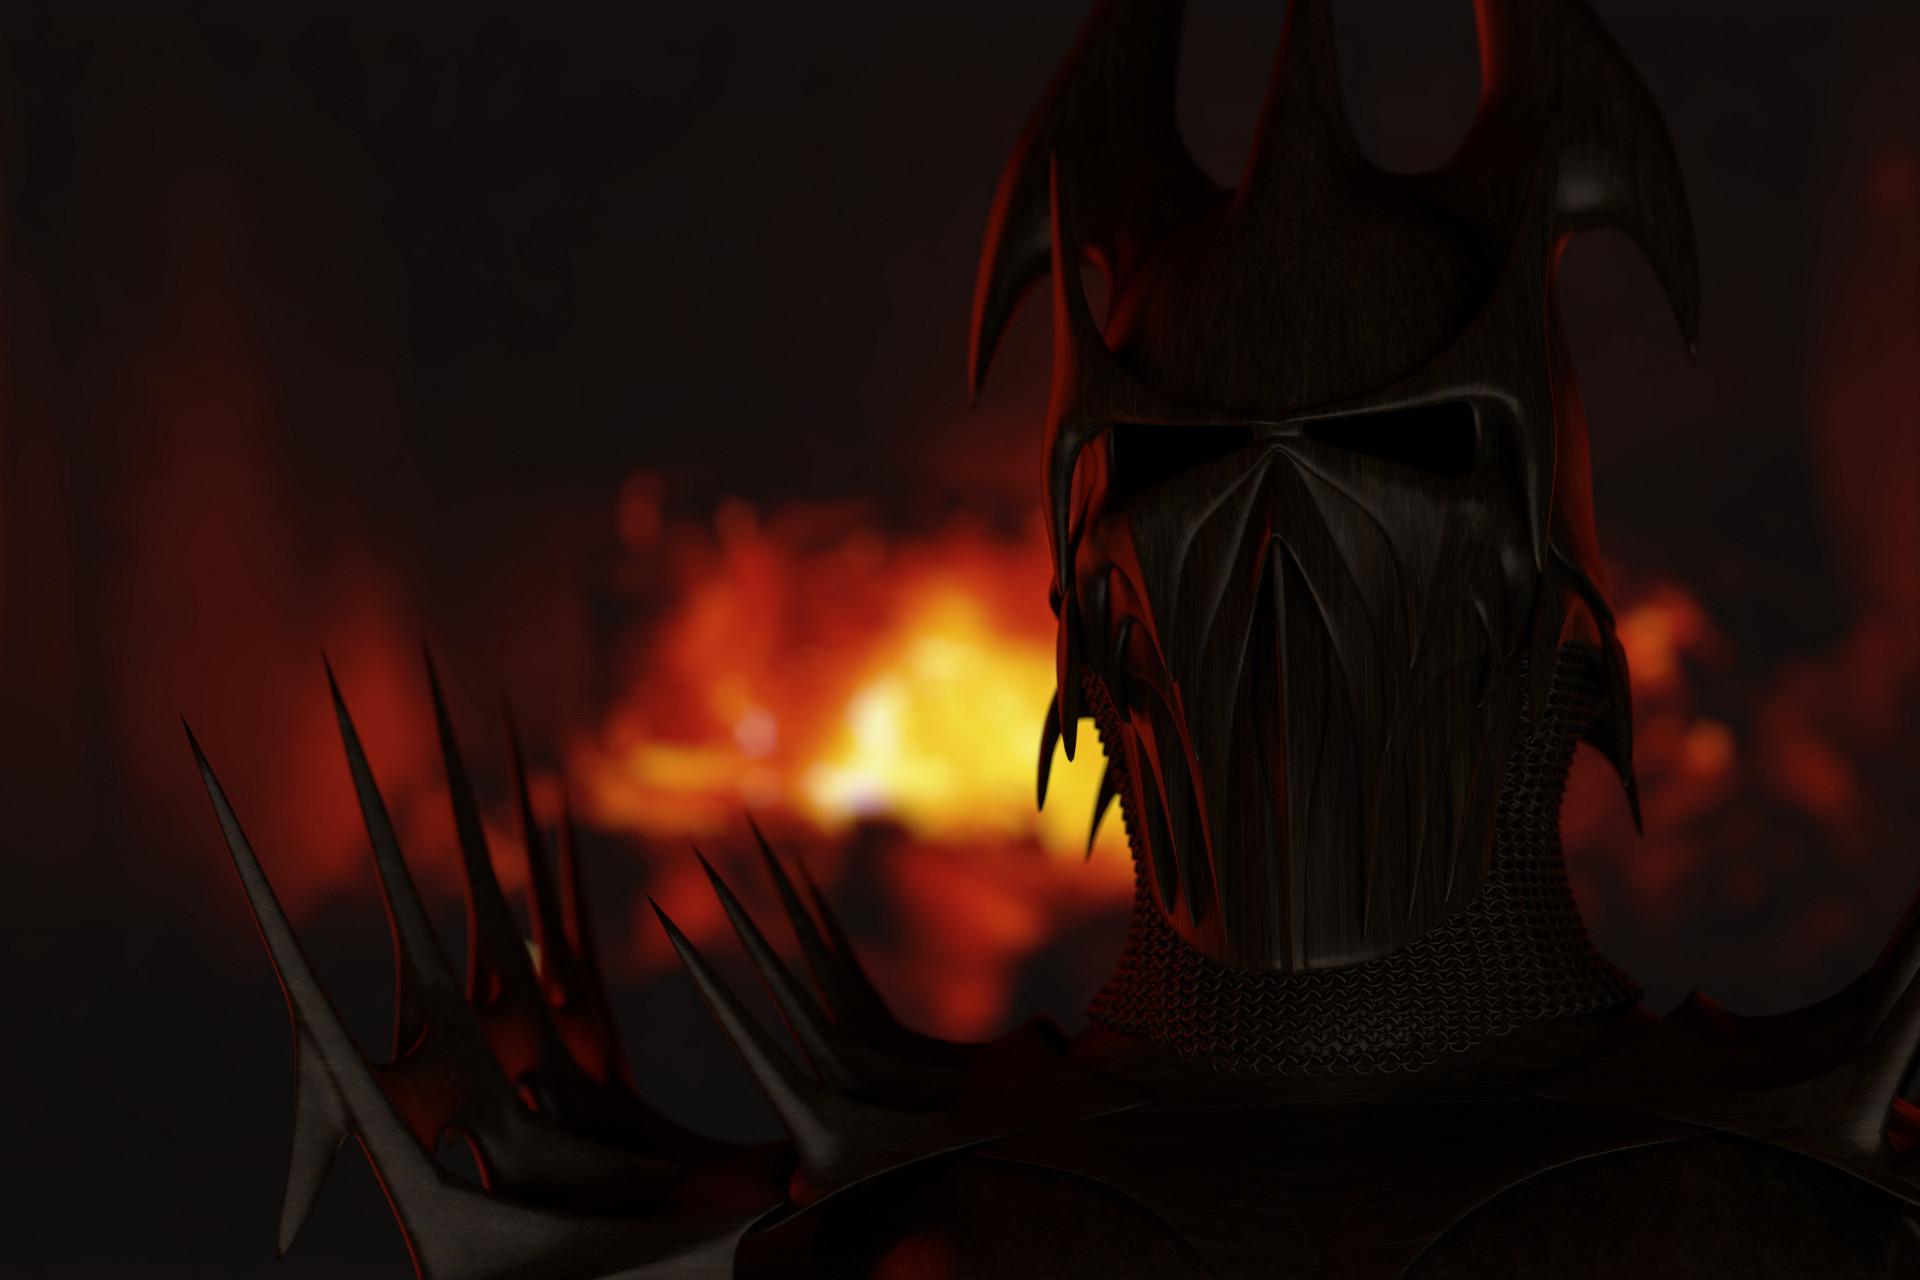 … Black Metal Kaiser by Flames …